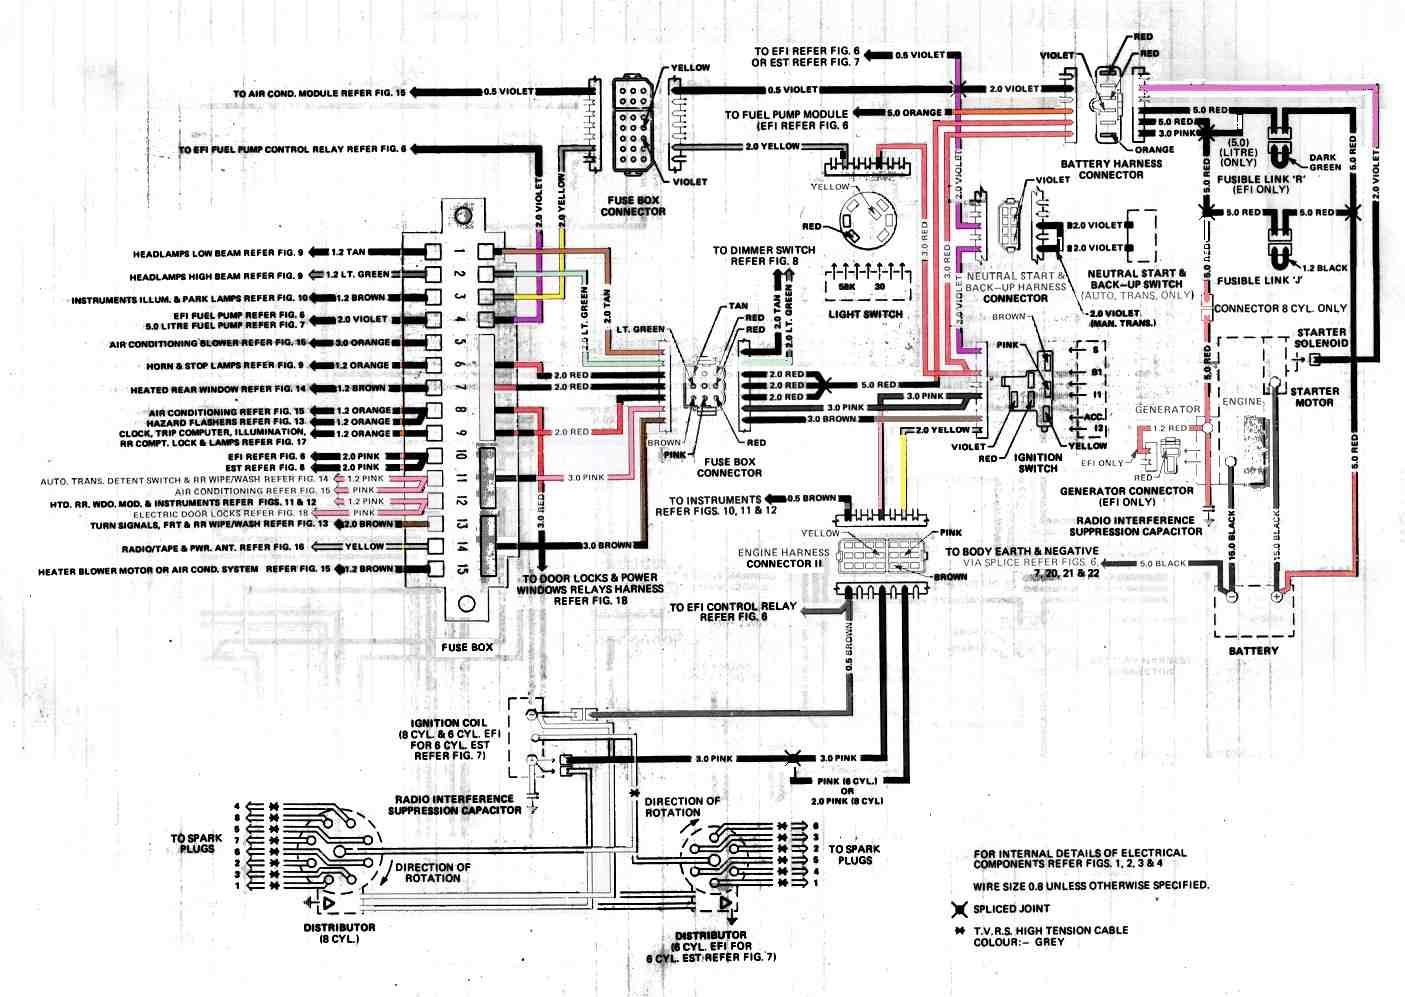 Electric Generators Diagram. Electric Generators Diagram T ...